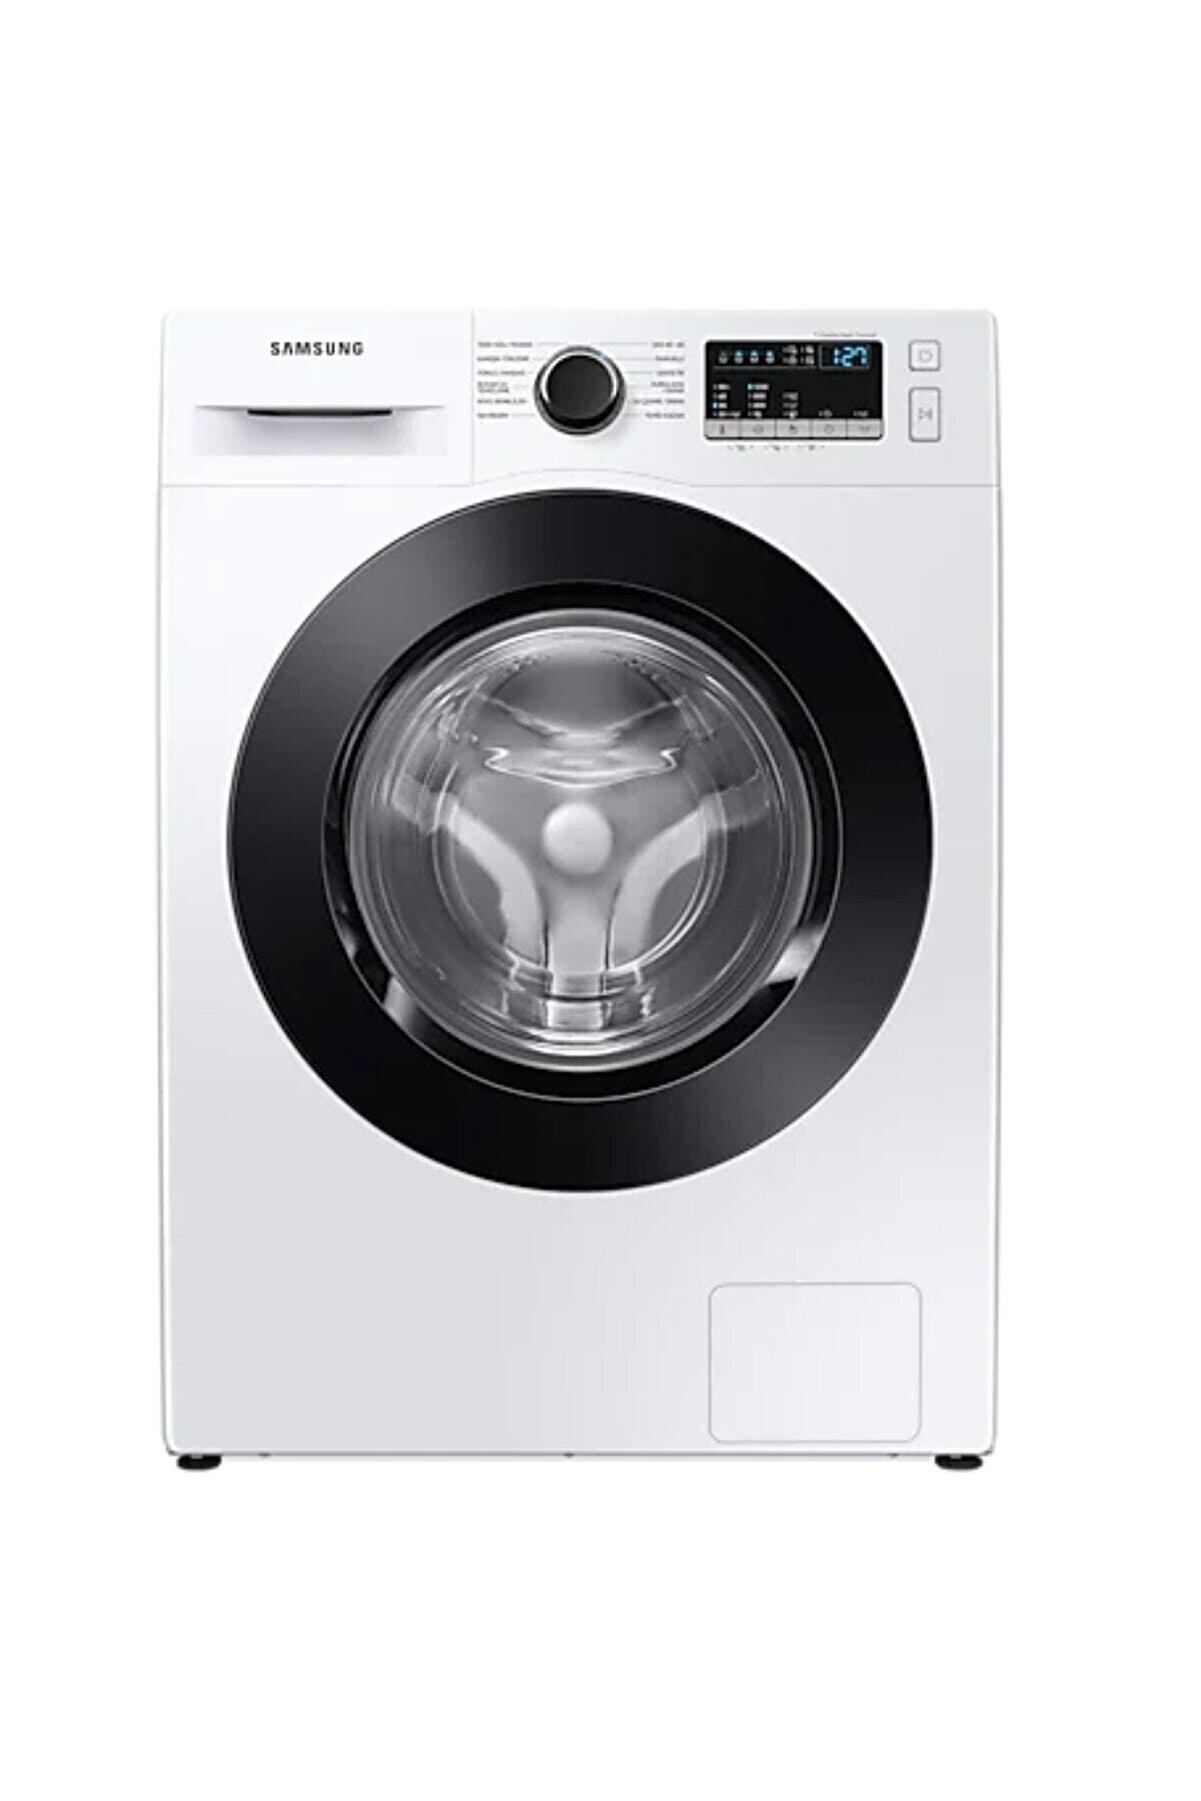 Samsung WW4000T WW90T4020CE/AH 1200 Devir 9 kg Çamaşır Makinesi